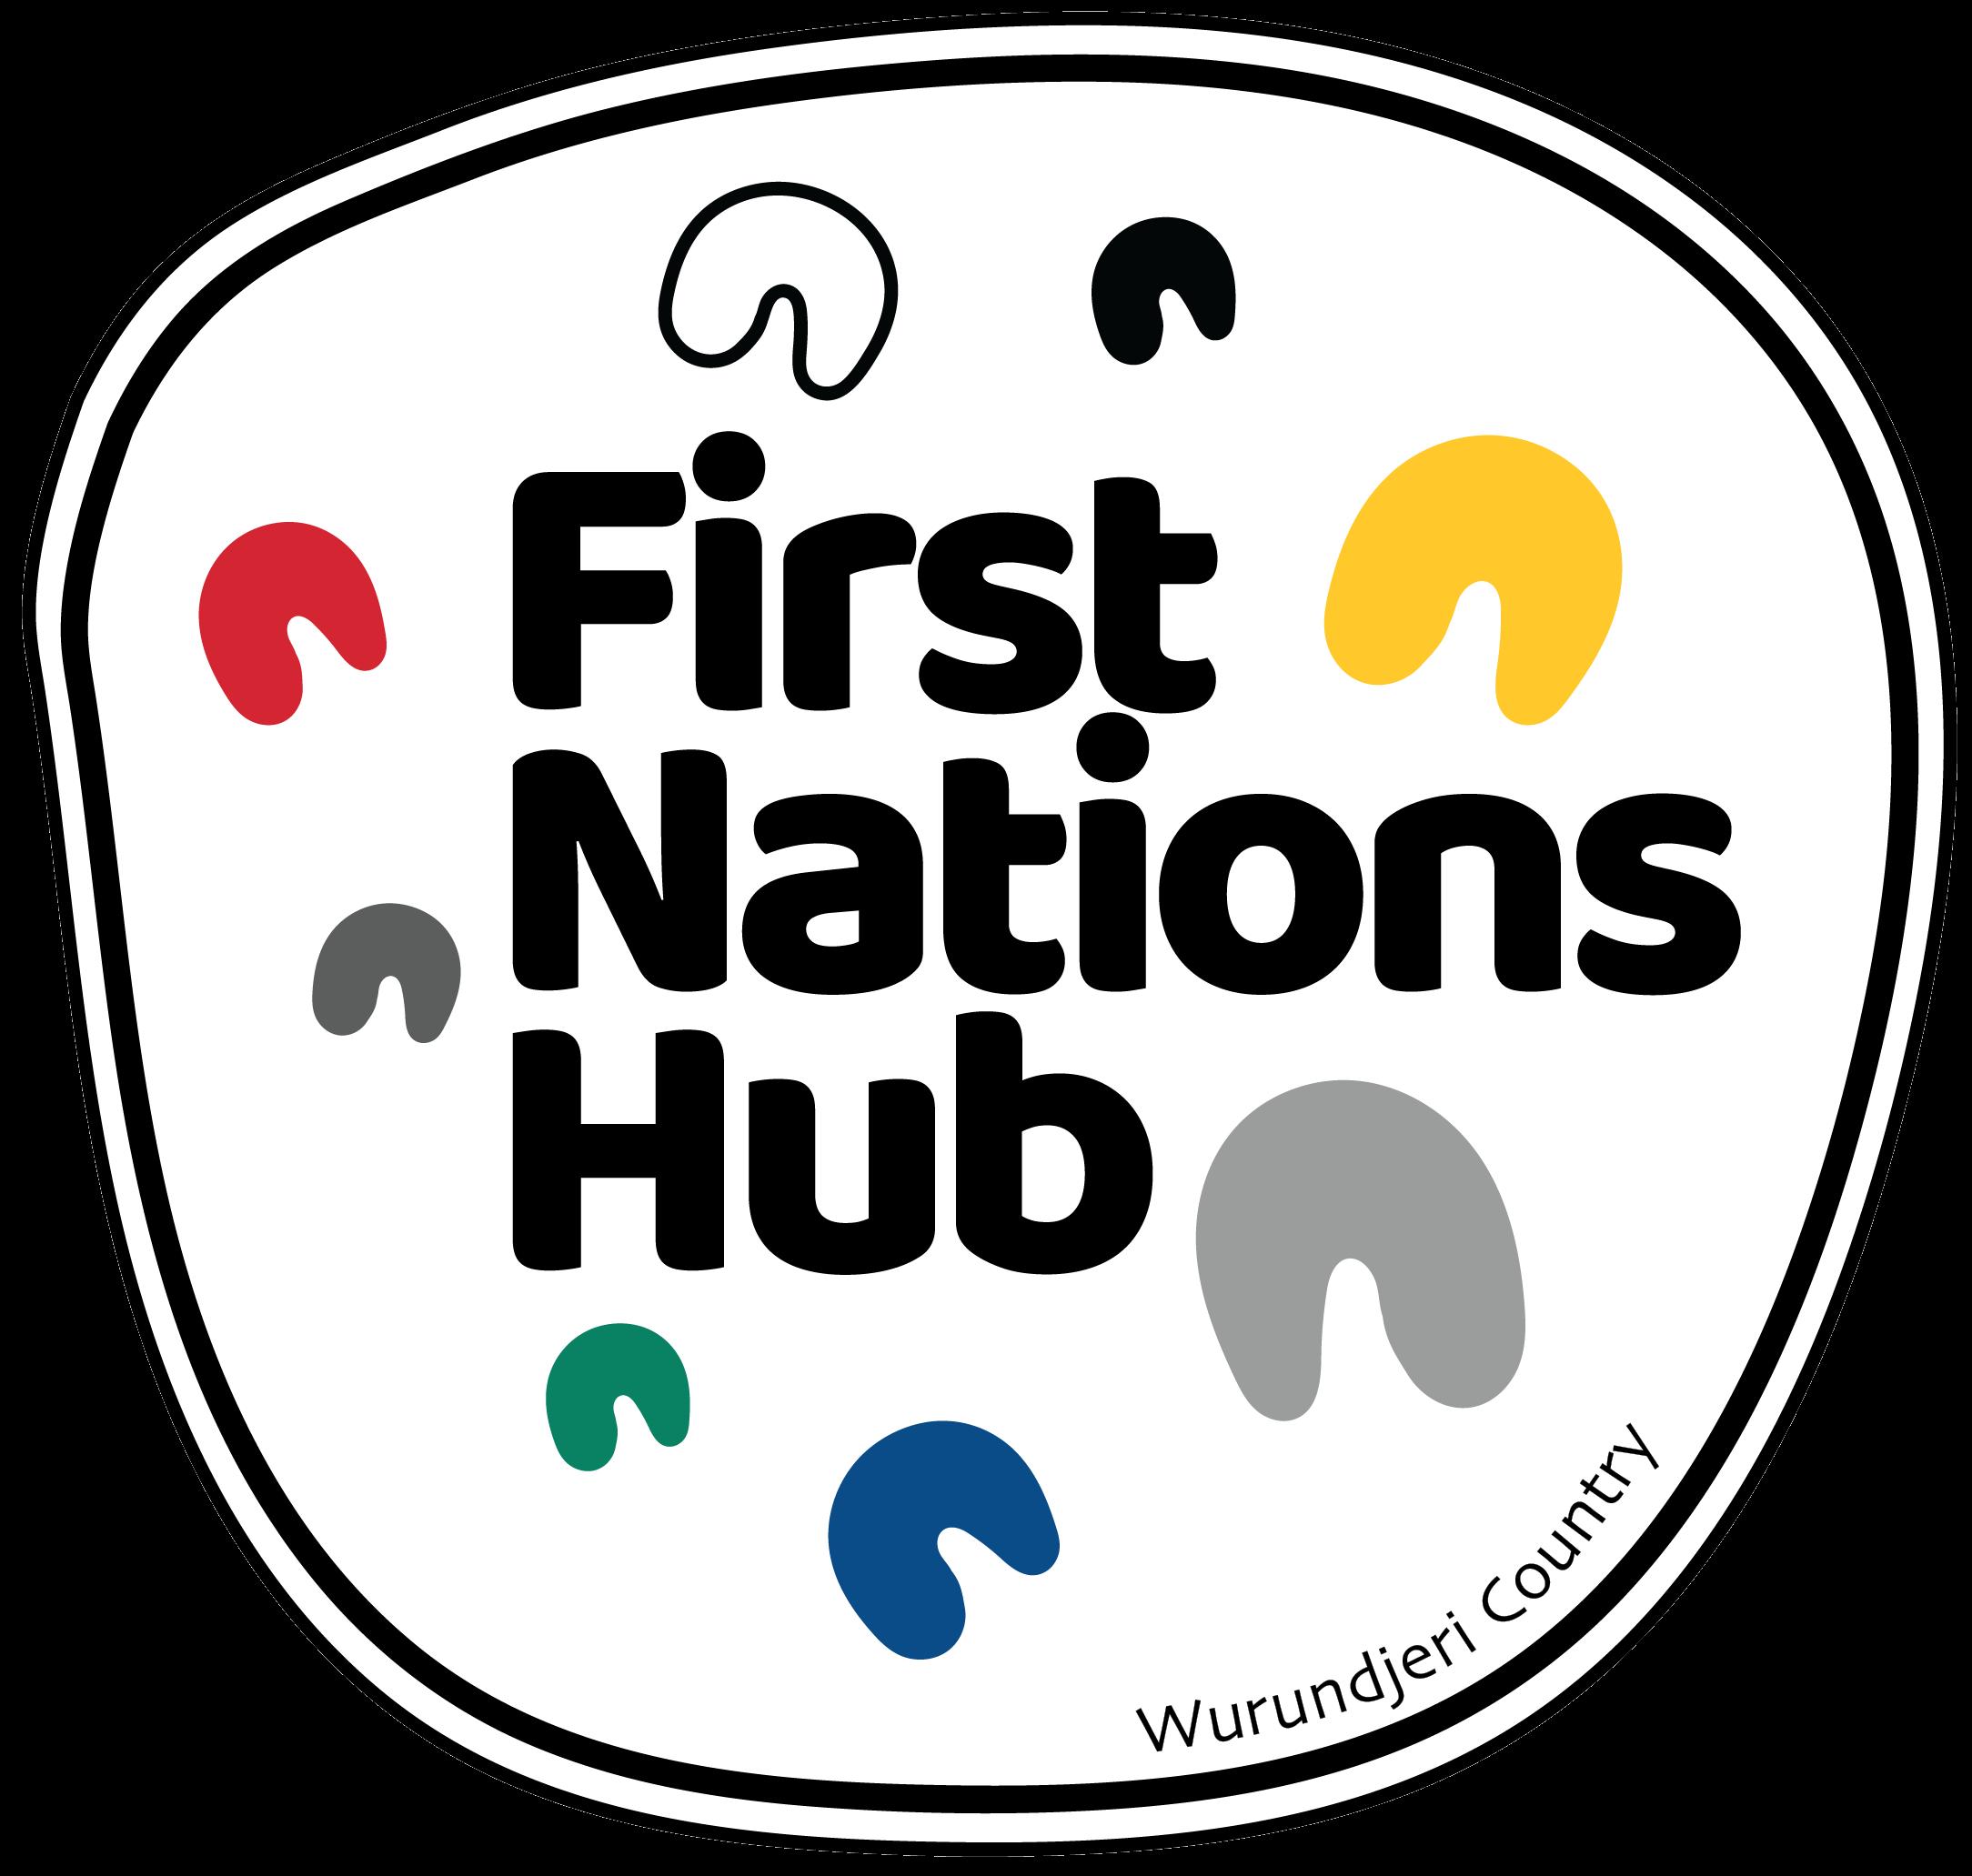 First Nations Hub